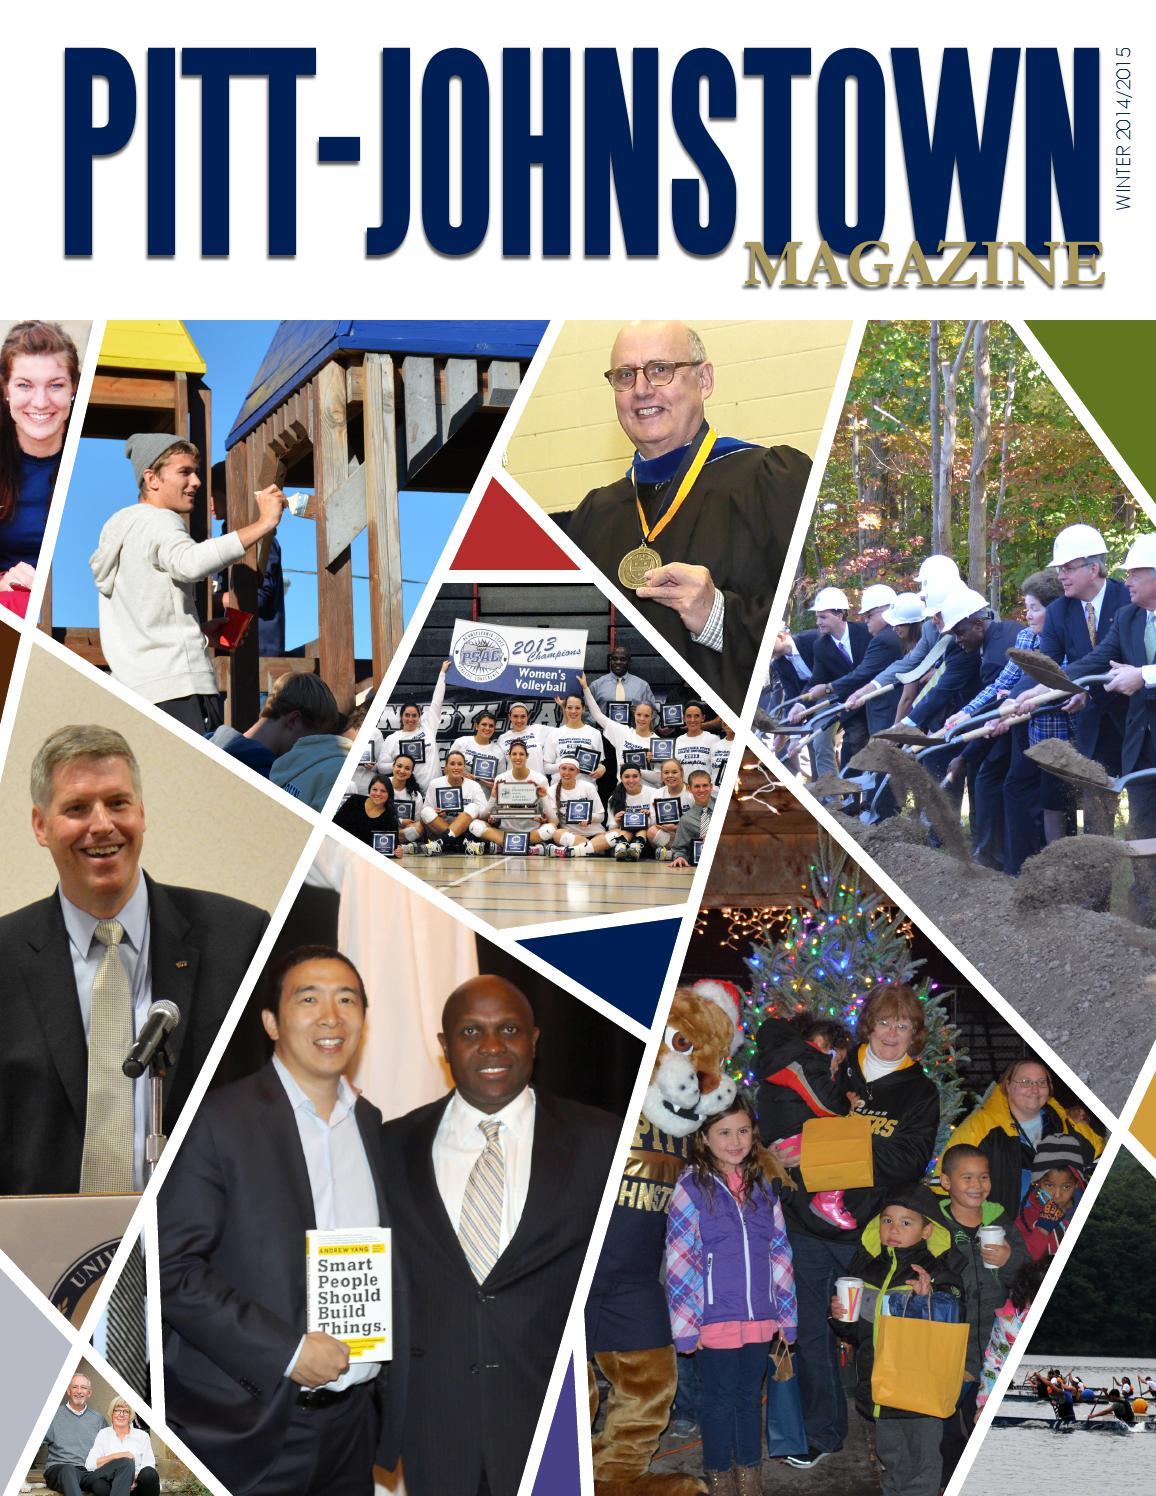 pittjohnstown magazine winter 20142015 by pitt